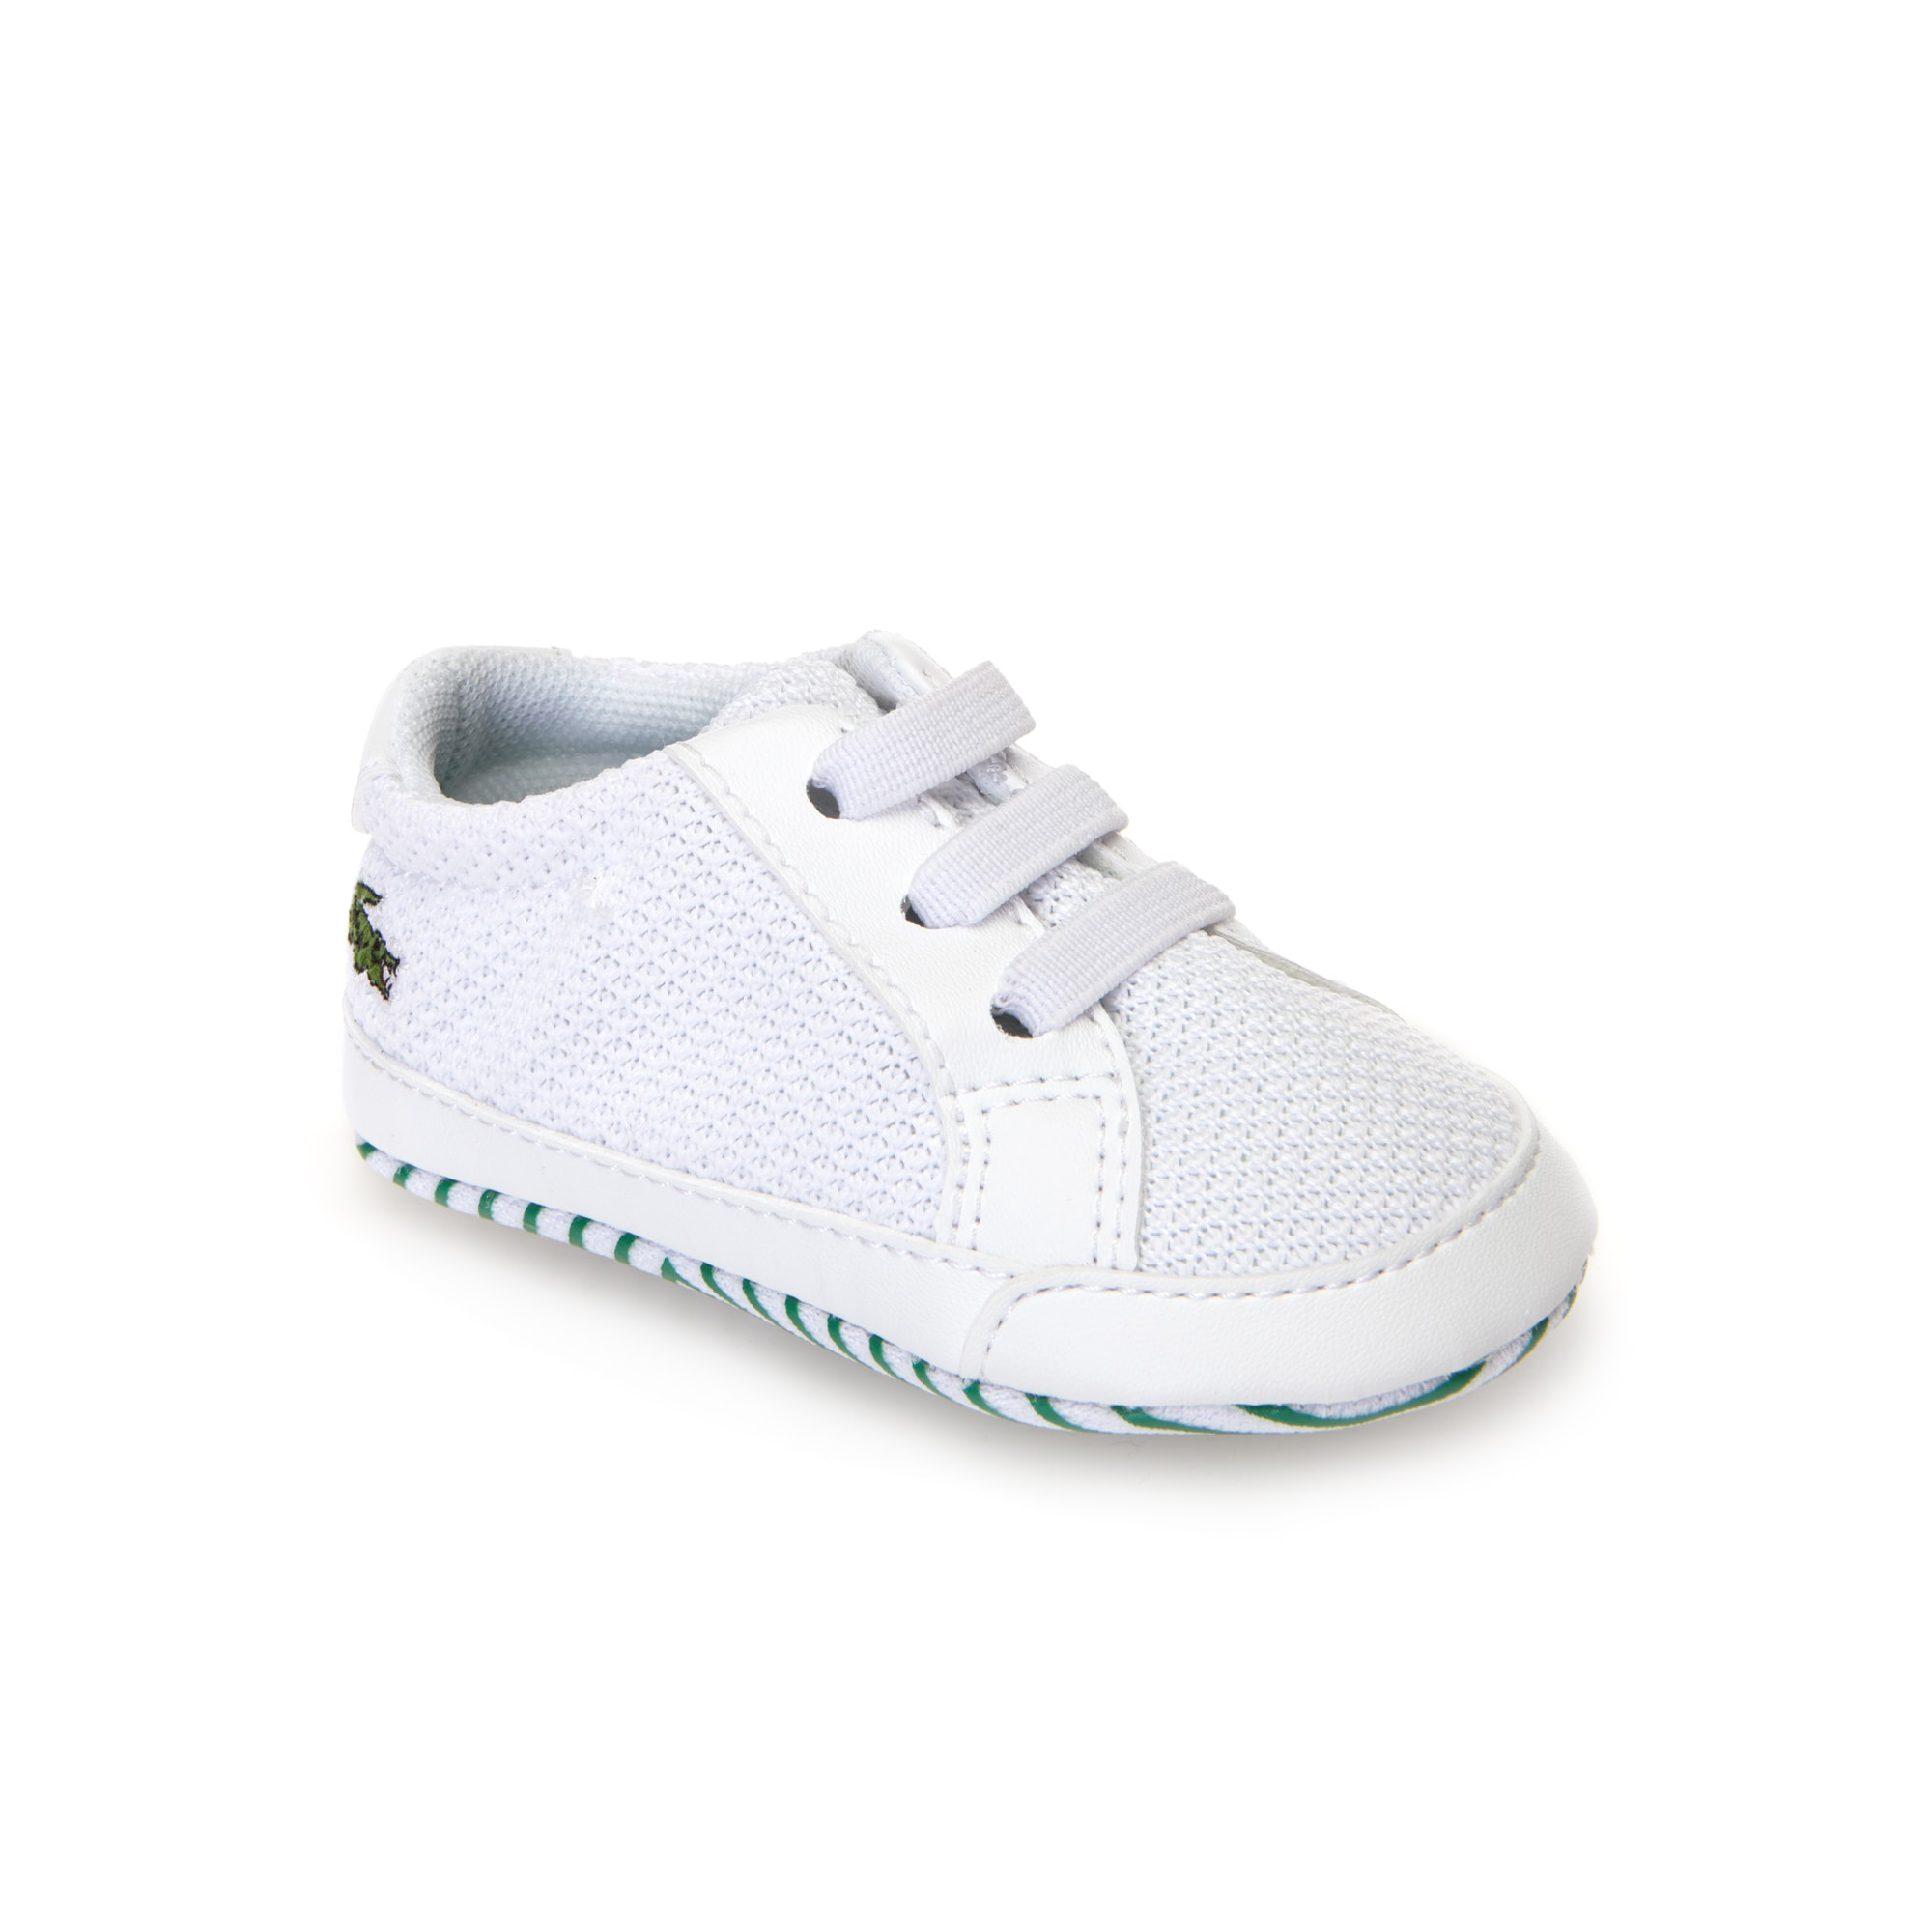 c7d254c47eda Babies  L.12.12 Crib Textile Sneakers